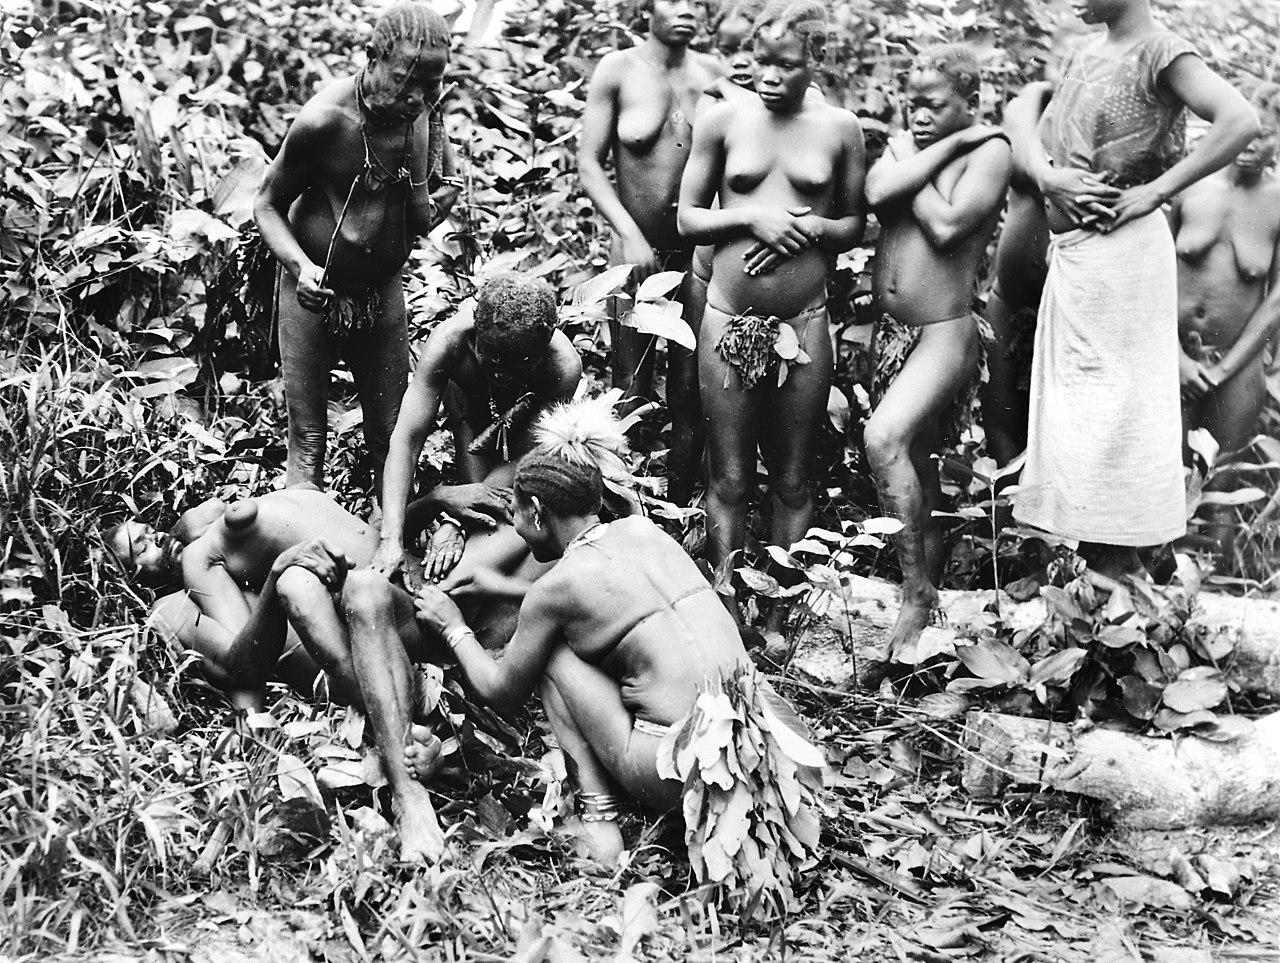 LES MUTILATIONS SEXUELLES FEMININES - gynsforg